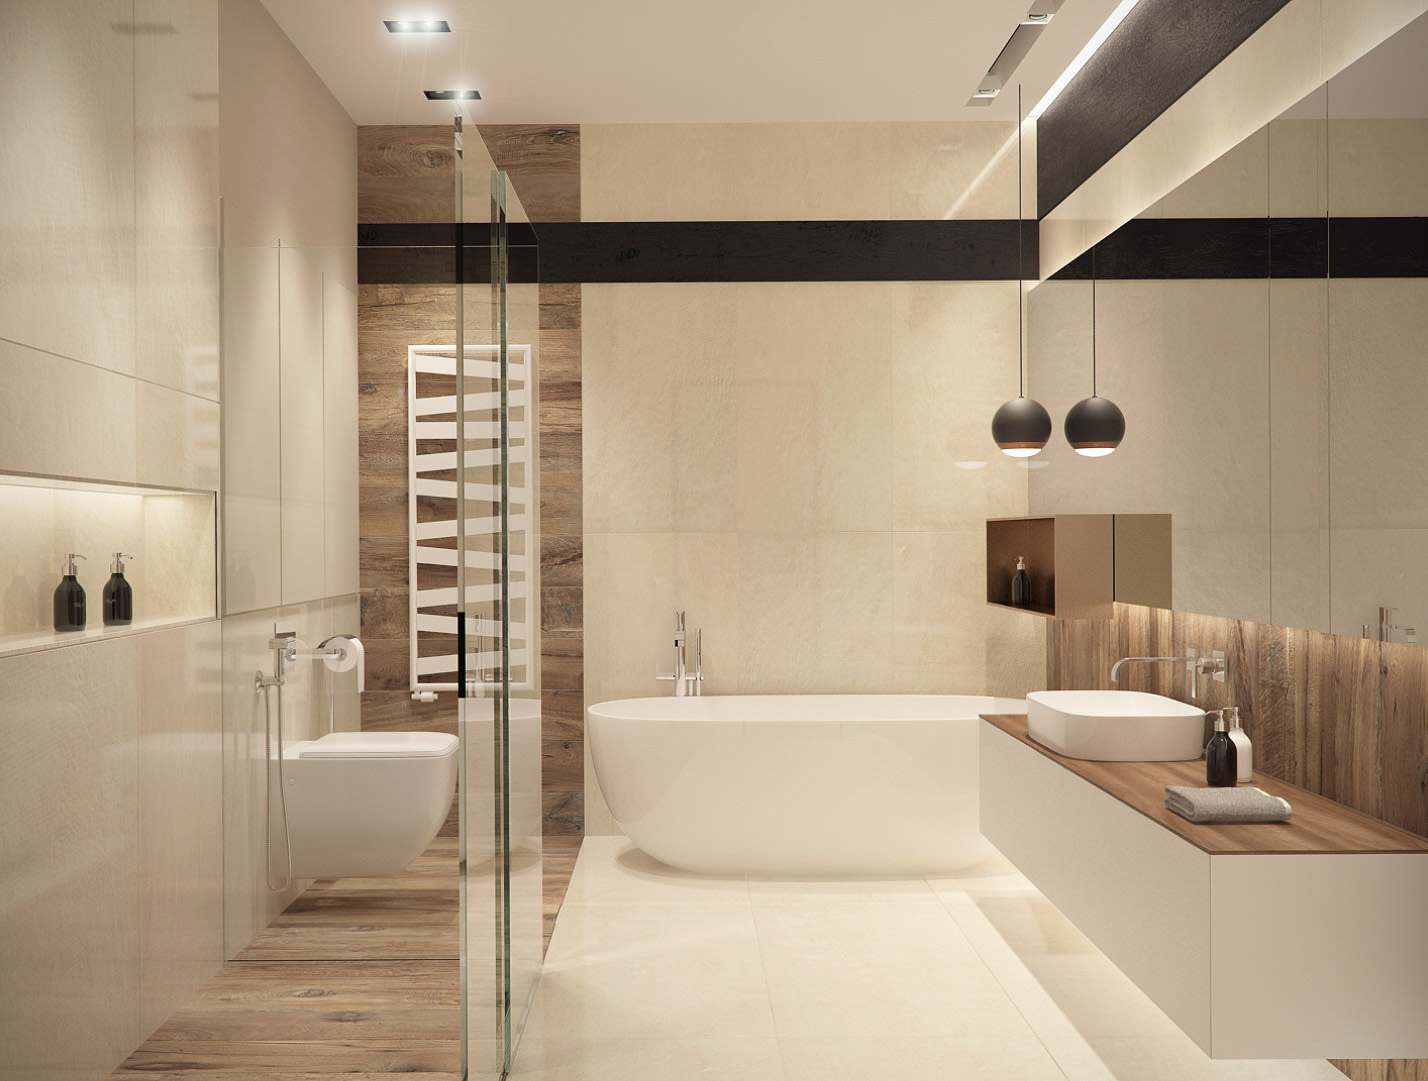 Master bathroom interior design by lera bykova